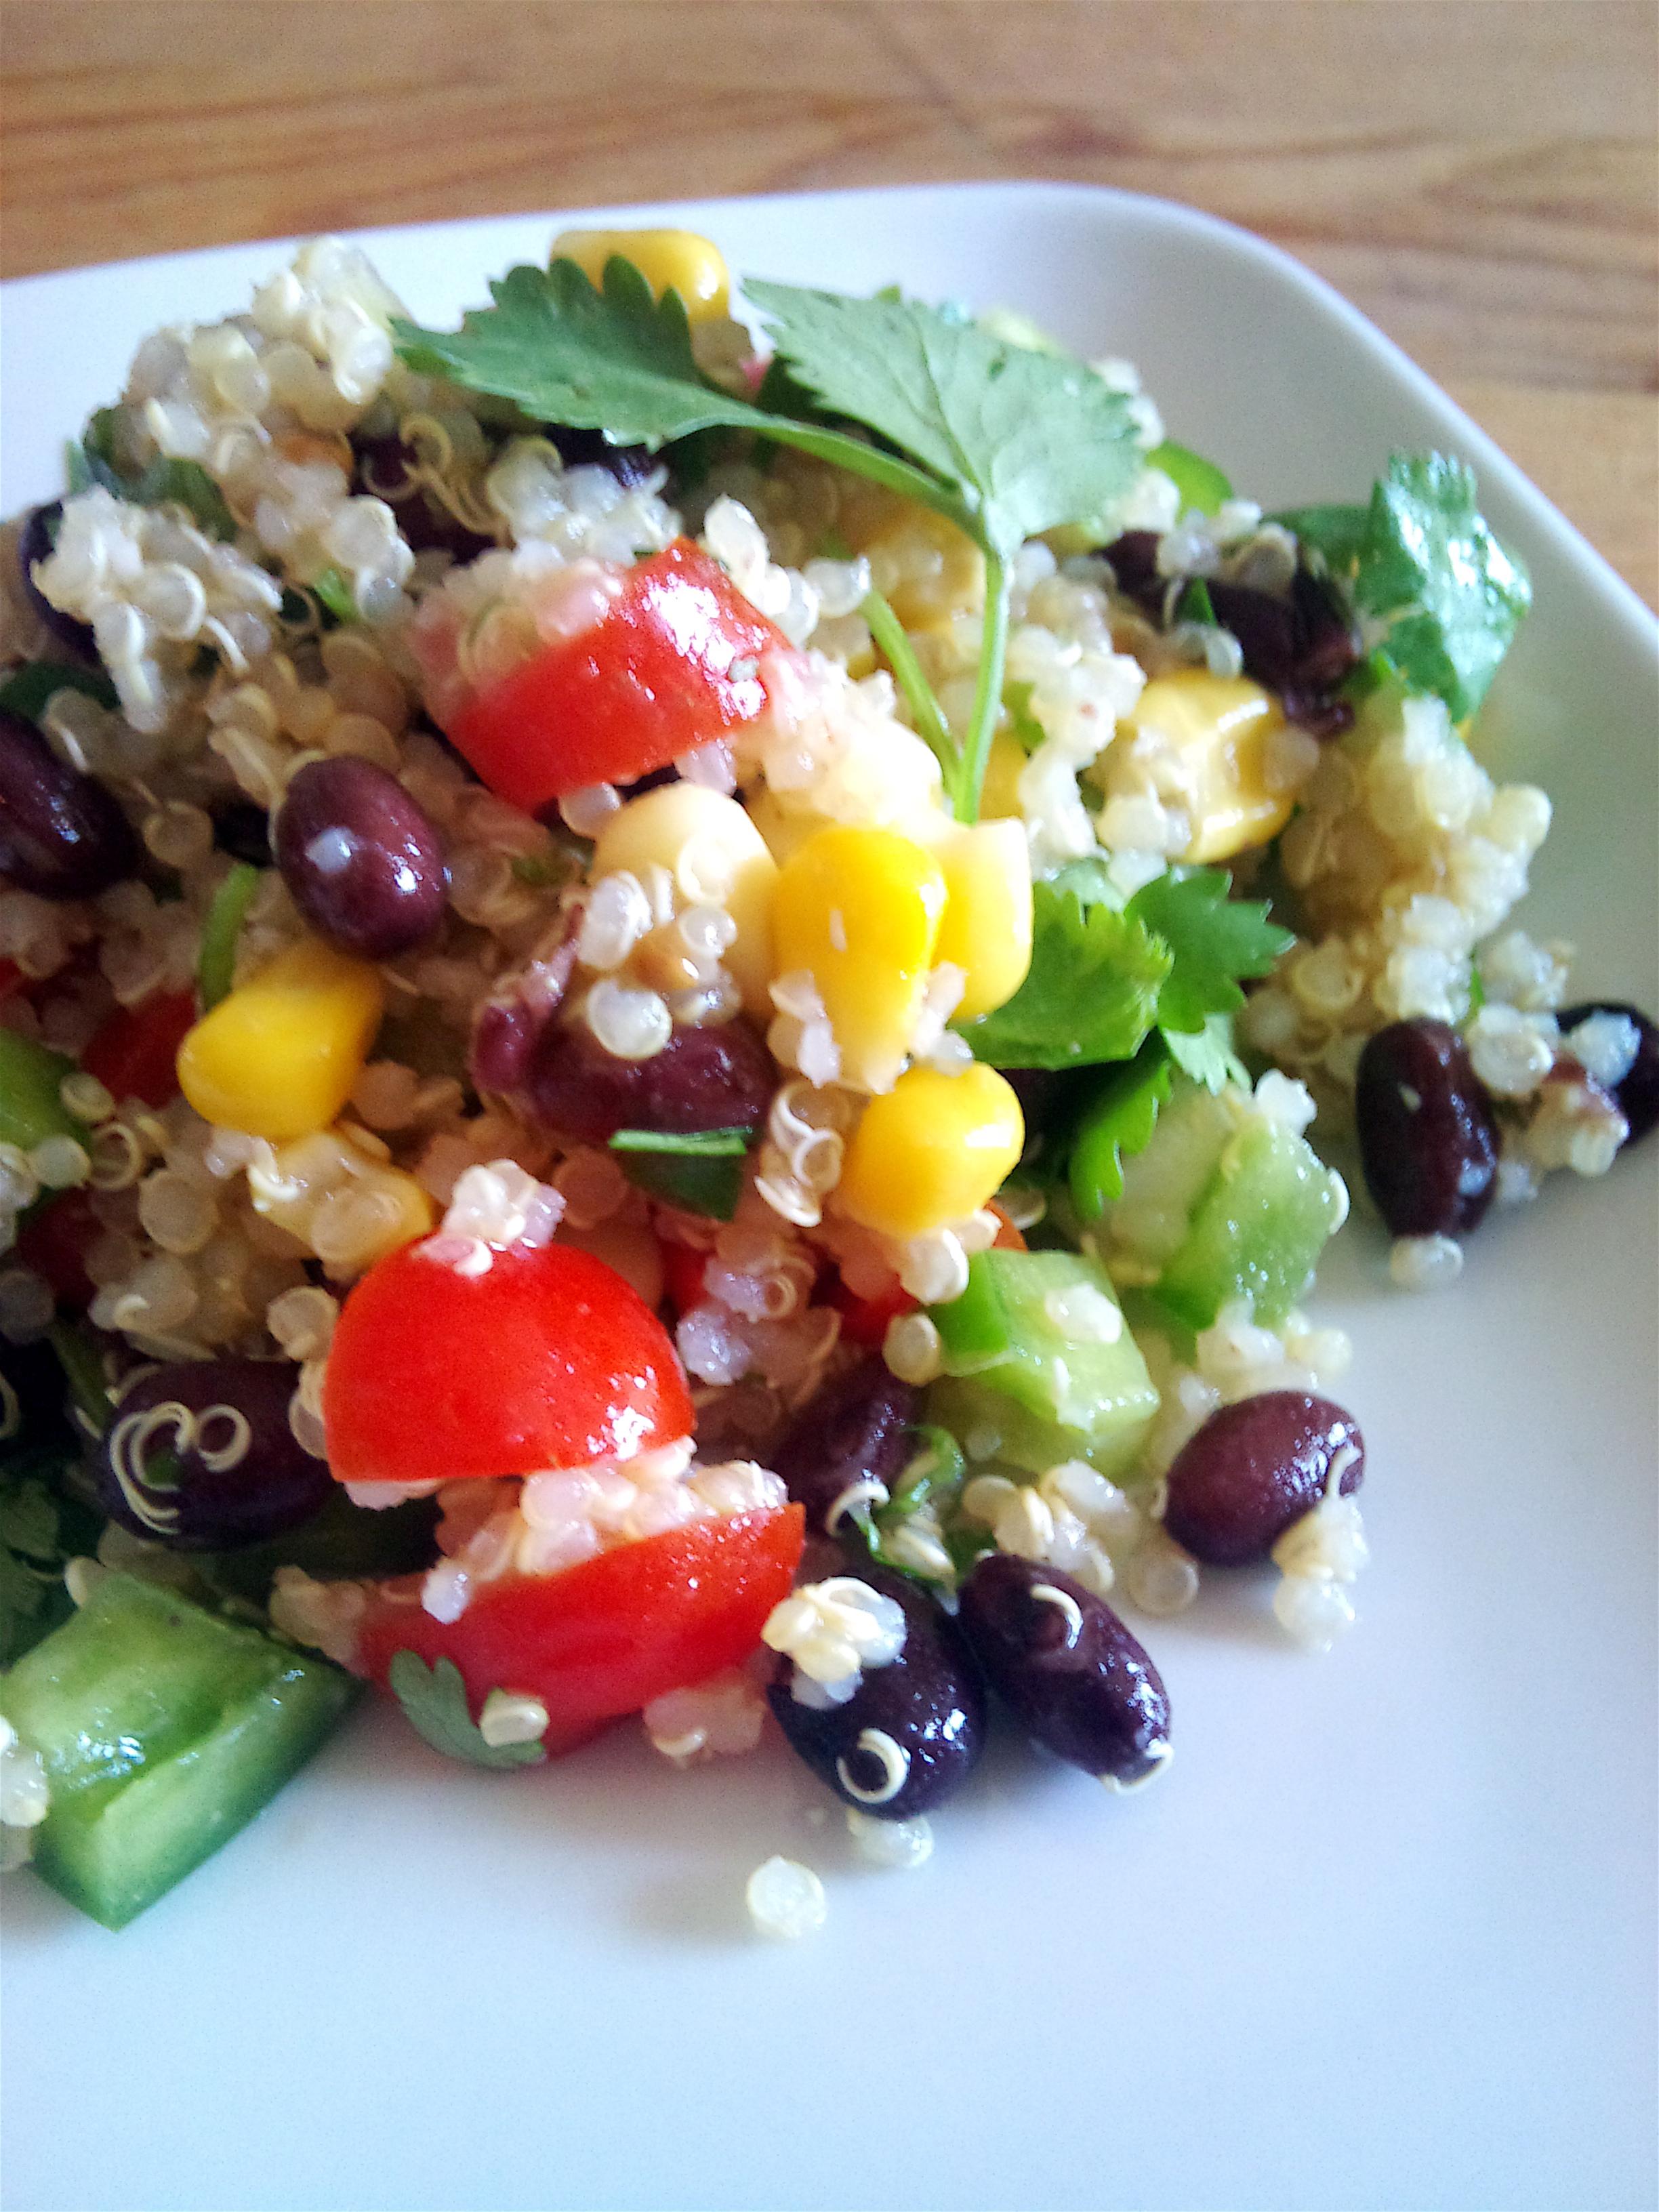 Red Quinoa And Black Bean Vegetable Salad Recipes — Dishmaps